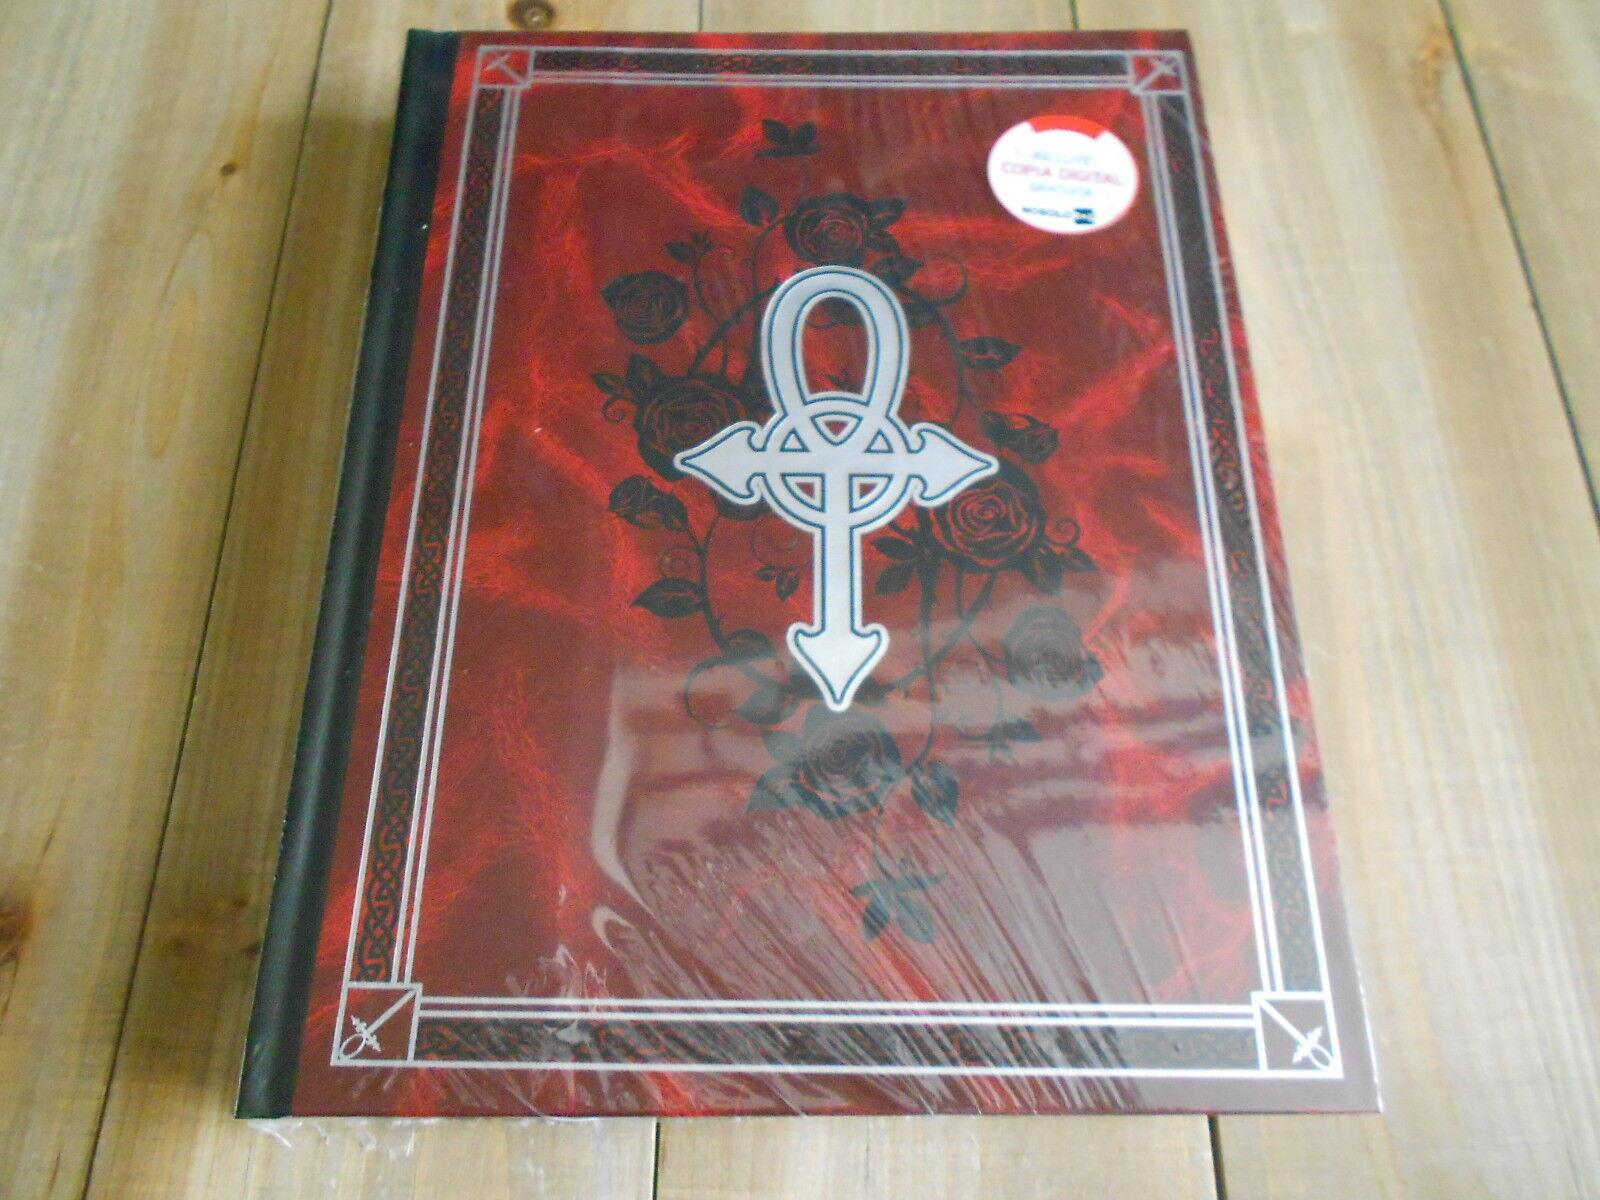 Vampire Age Dark - Book Basic Deluxe - - - Set Role Play - Nosolgoldl 20 093b0c